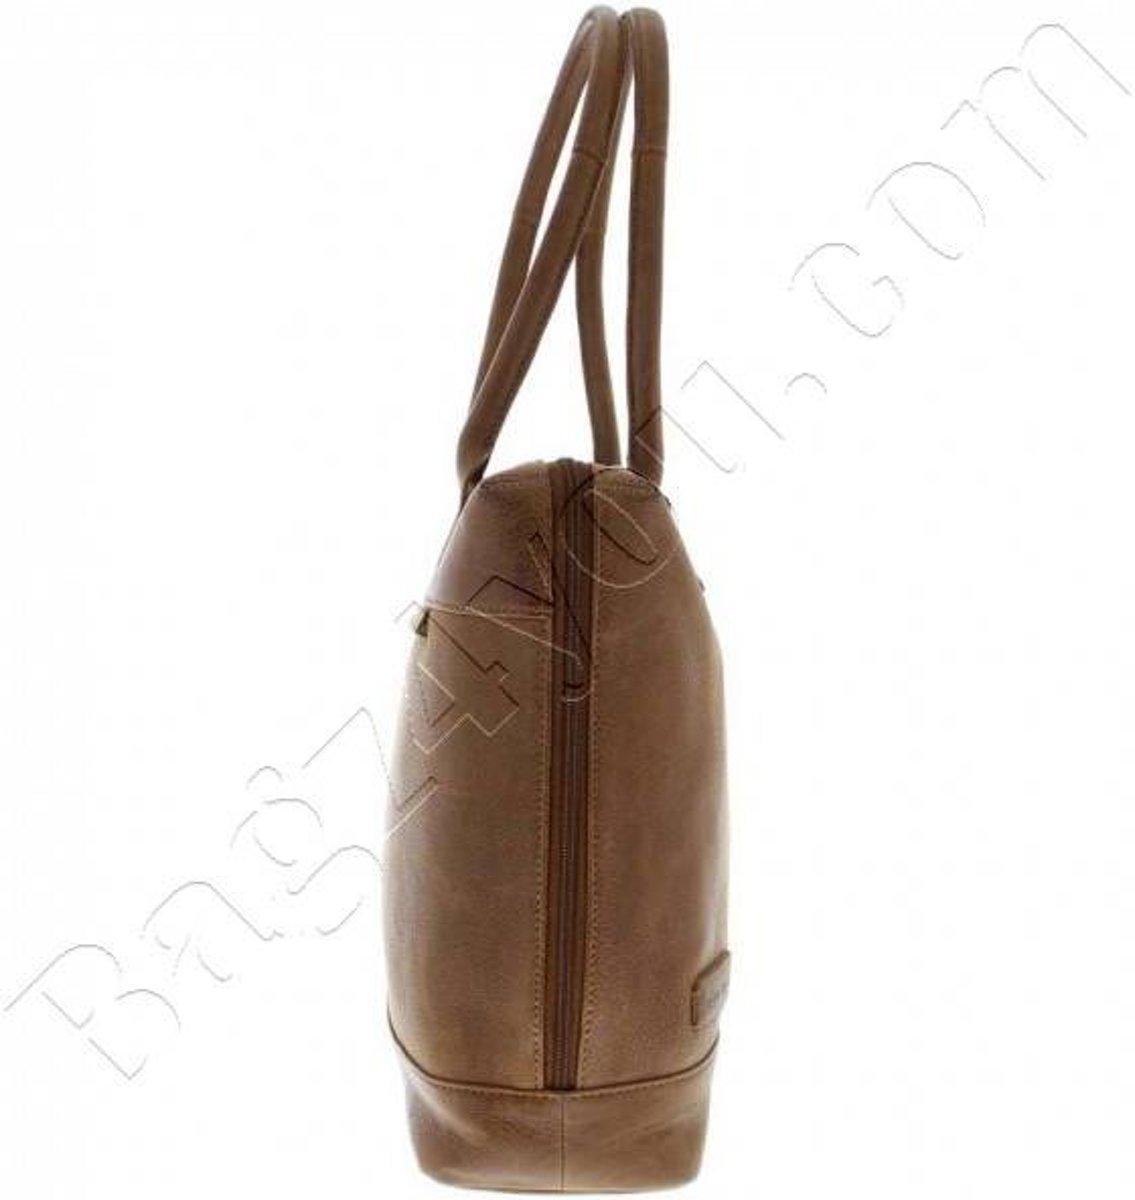 7da1f30f845 bol.com | Plevier Business/laptoptas dames volnerf rundleer 1-vaks 15.6  Cognac 475